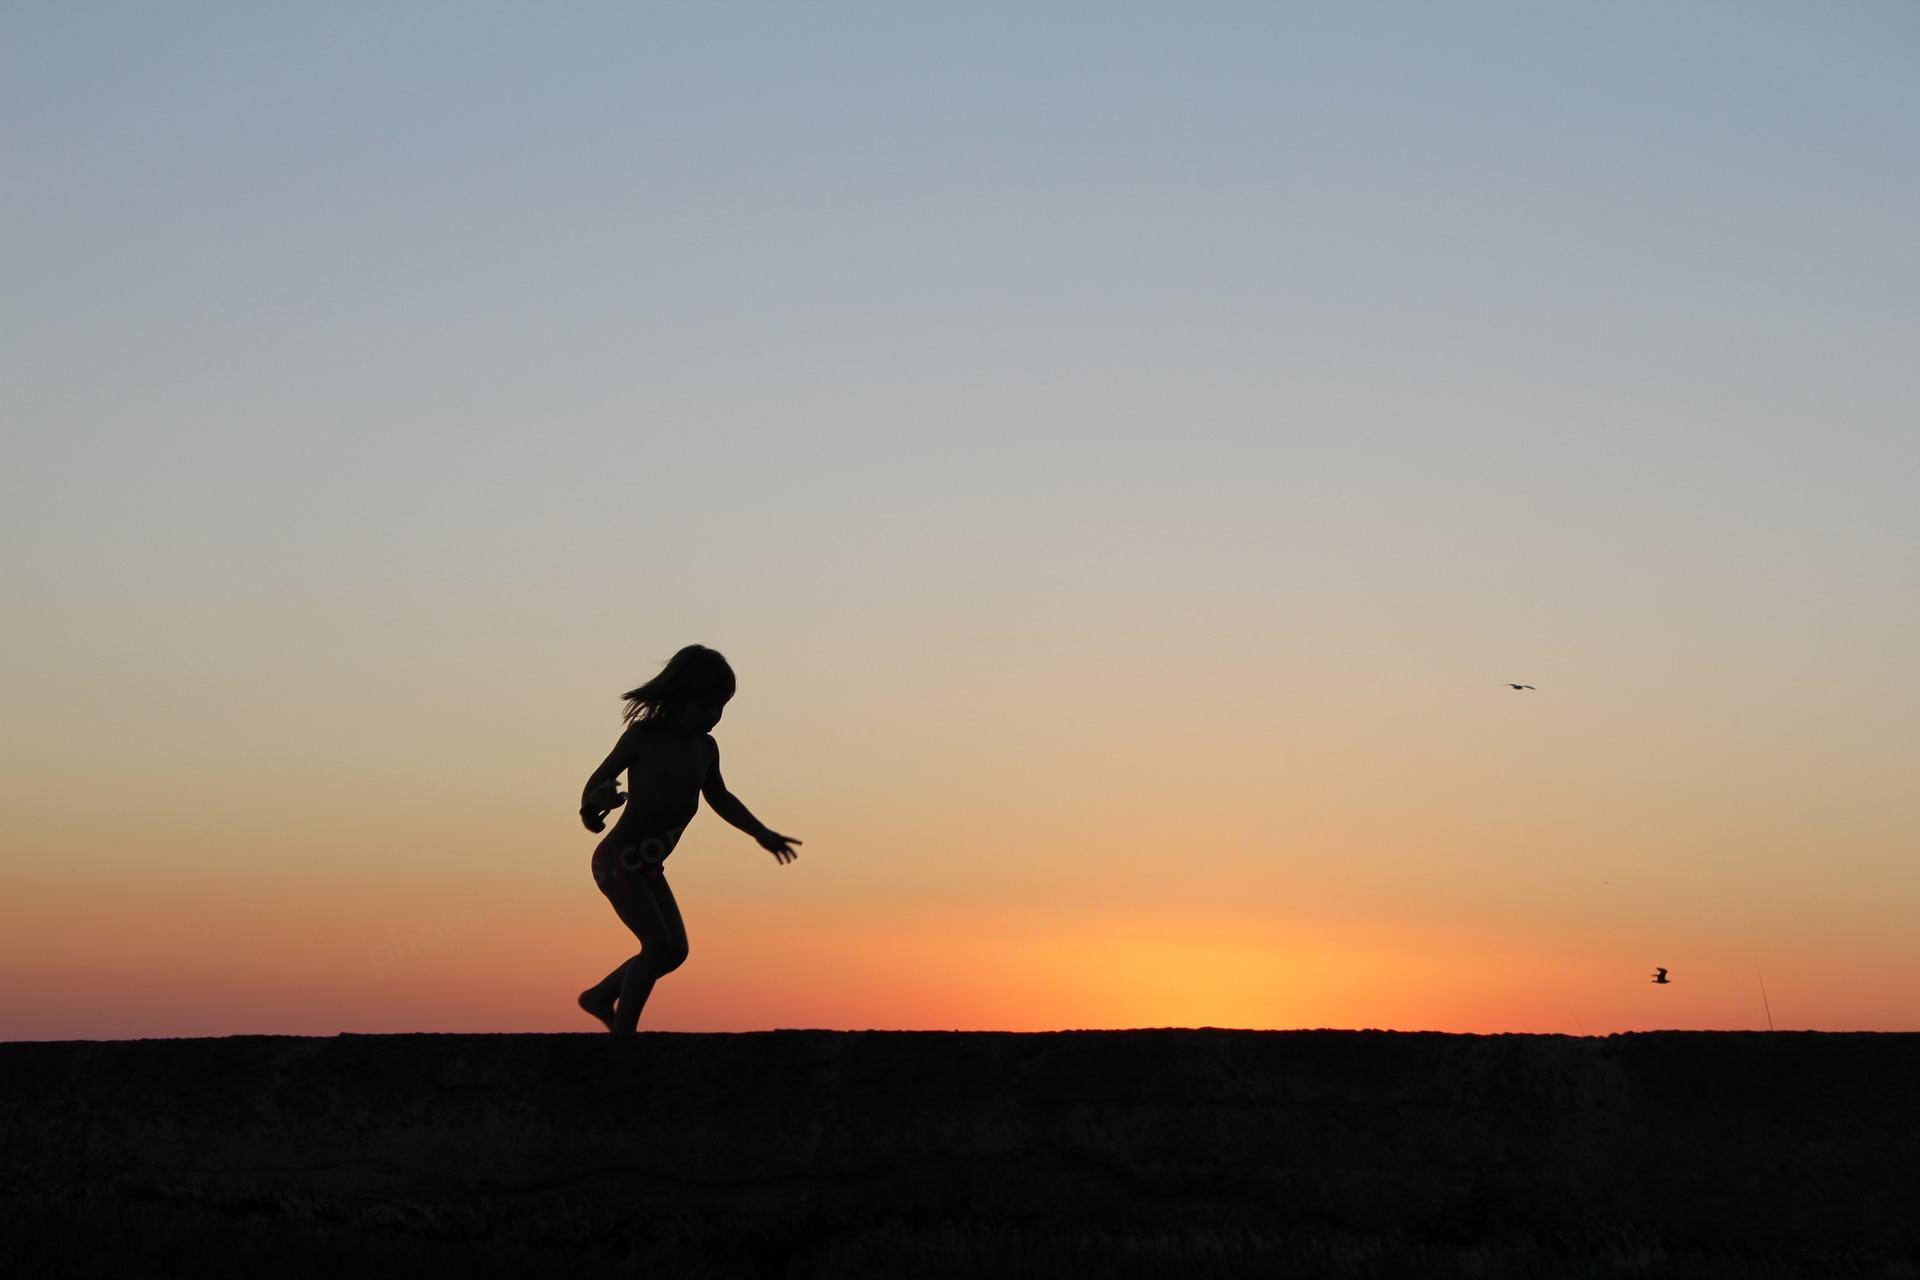 Running girl shown in silhouette